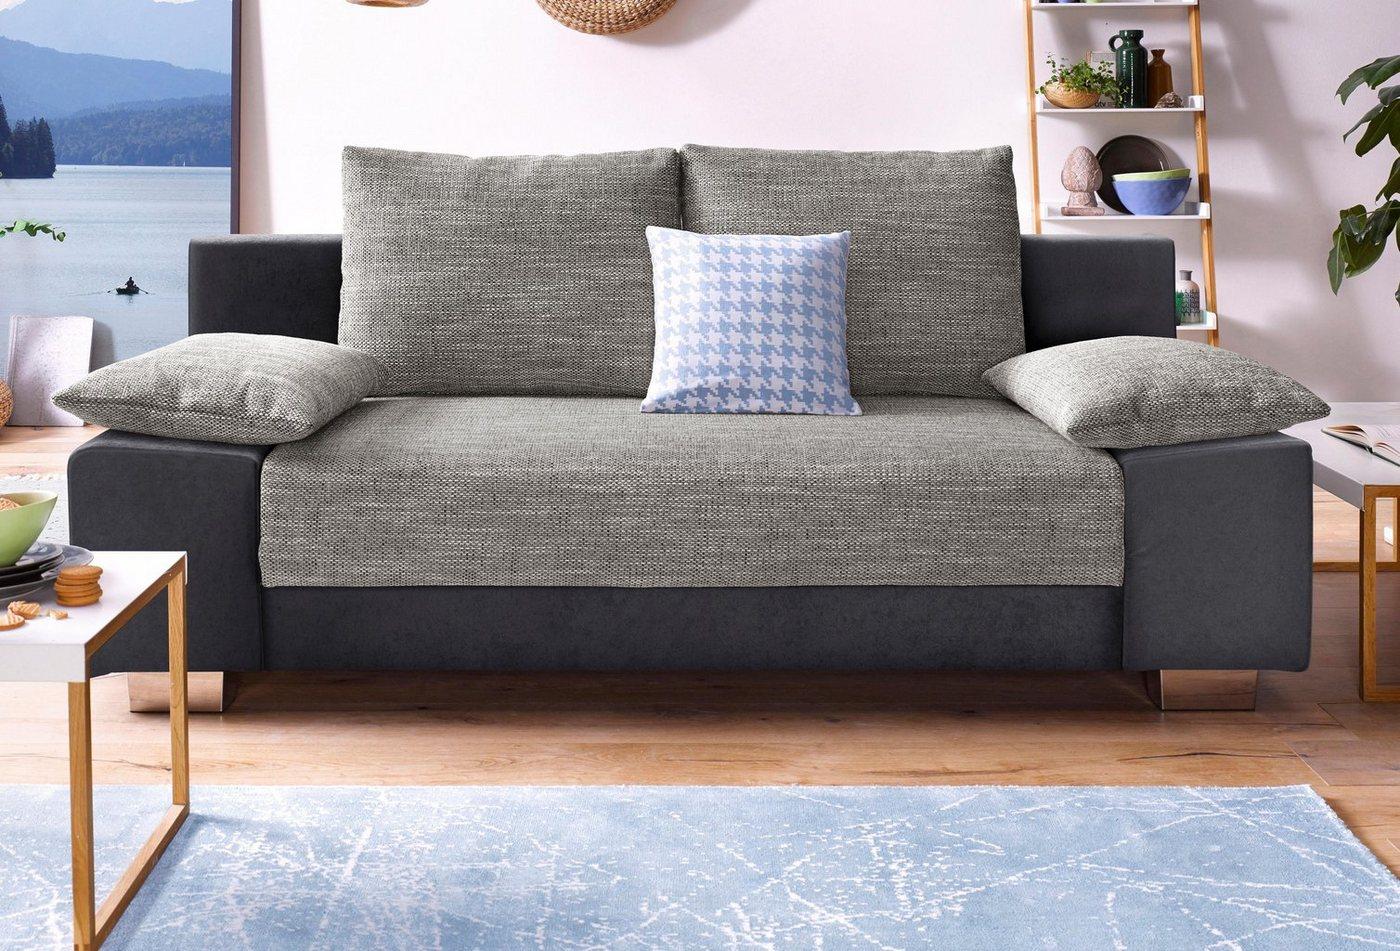 Collection AB bedbank, inclusief bedkist en binnenvering